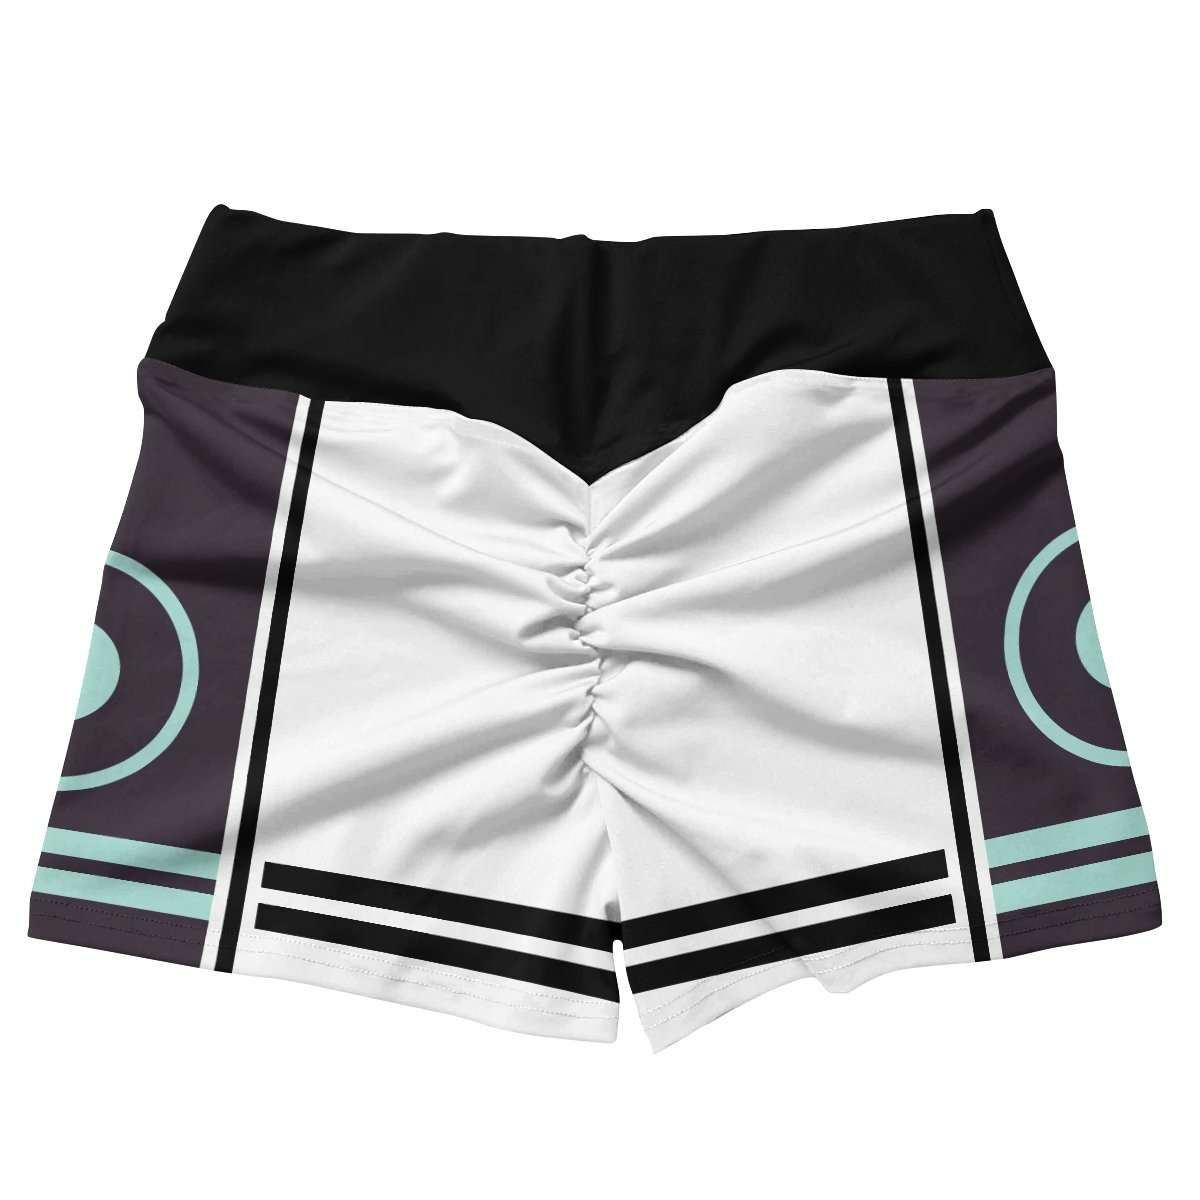 legend sukuna active wear set 699439 - Anime Swimsuits